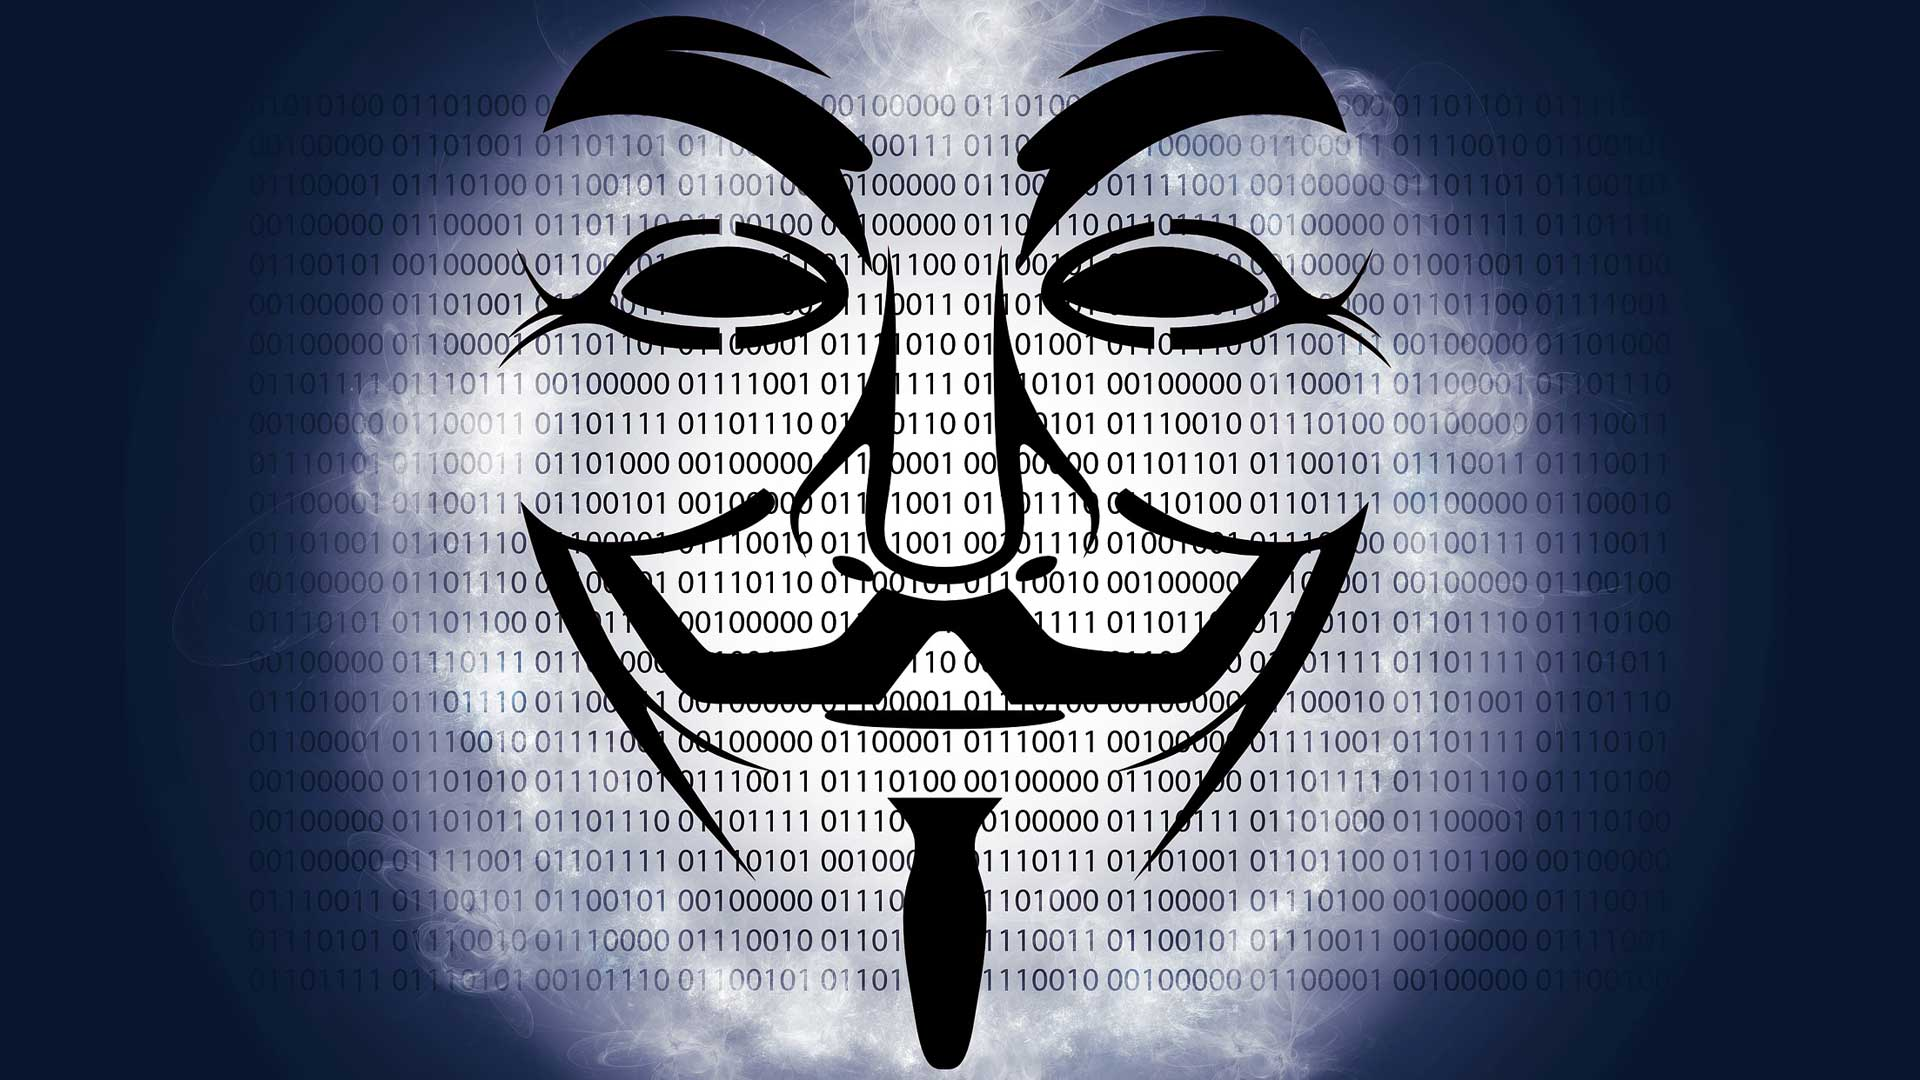 Цифровая матрица и маска на переднем плане